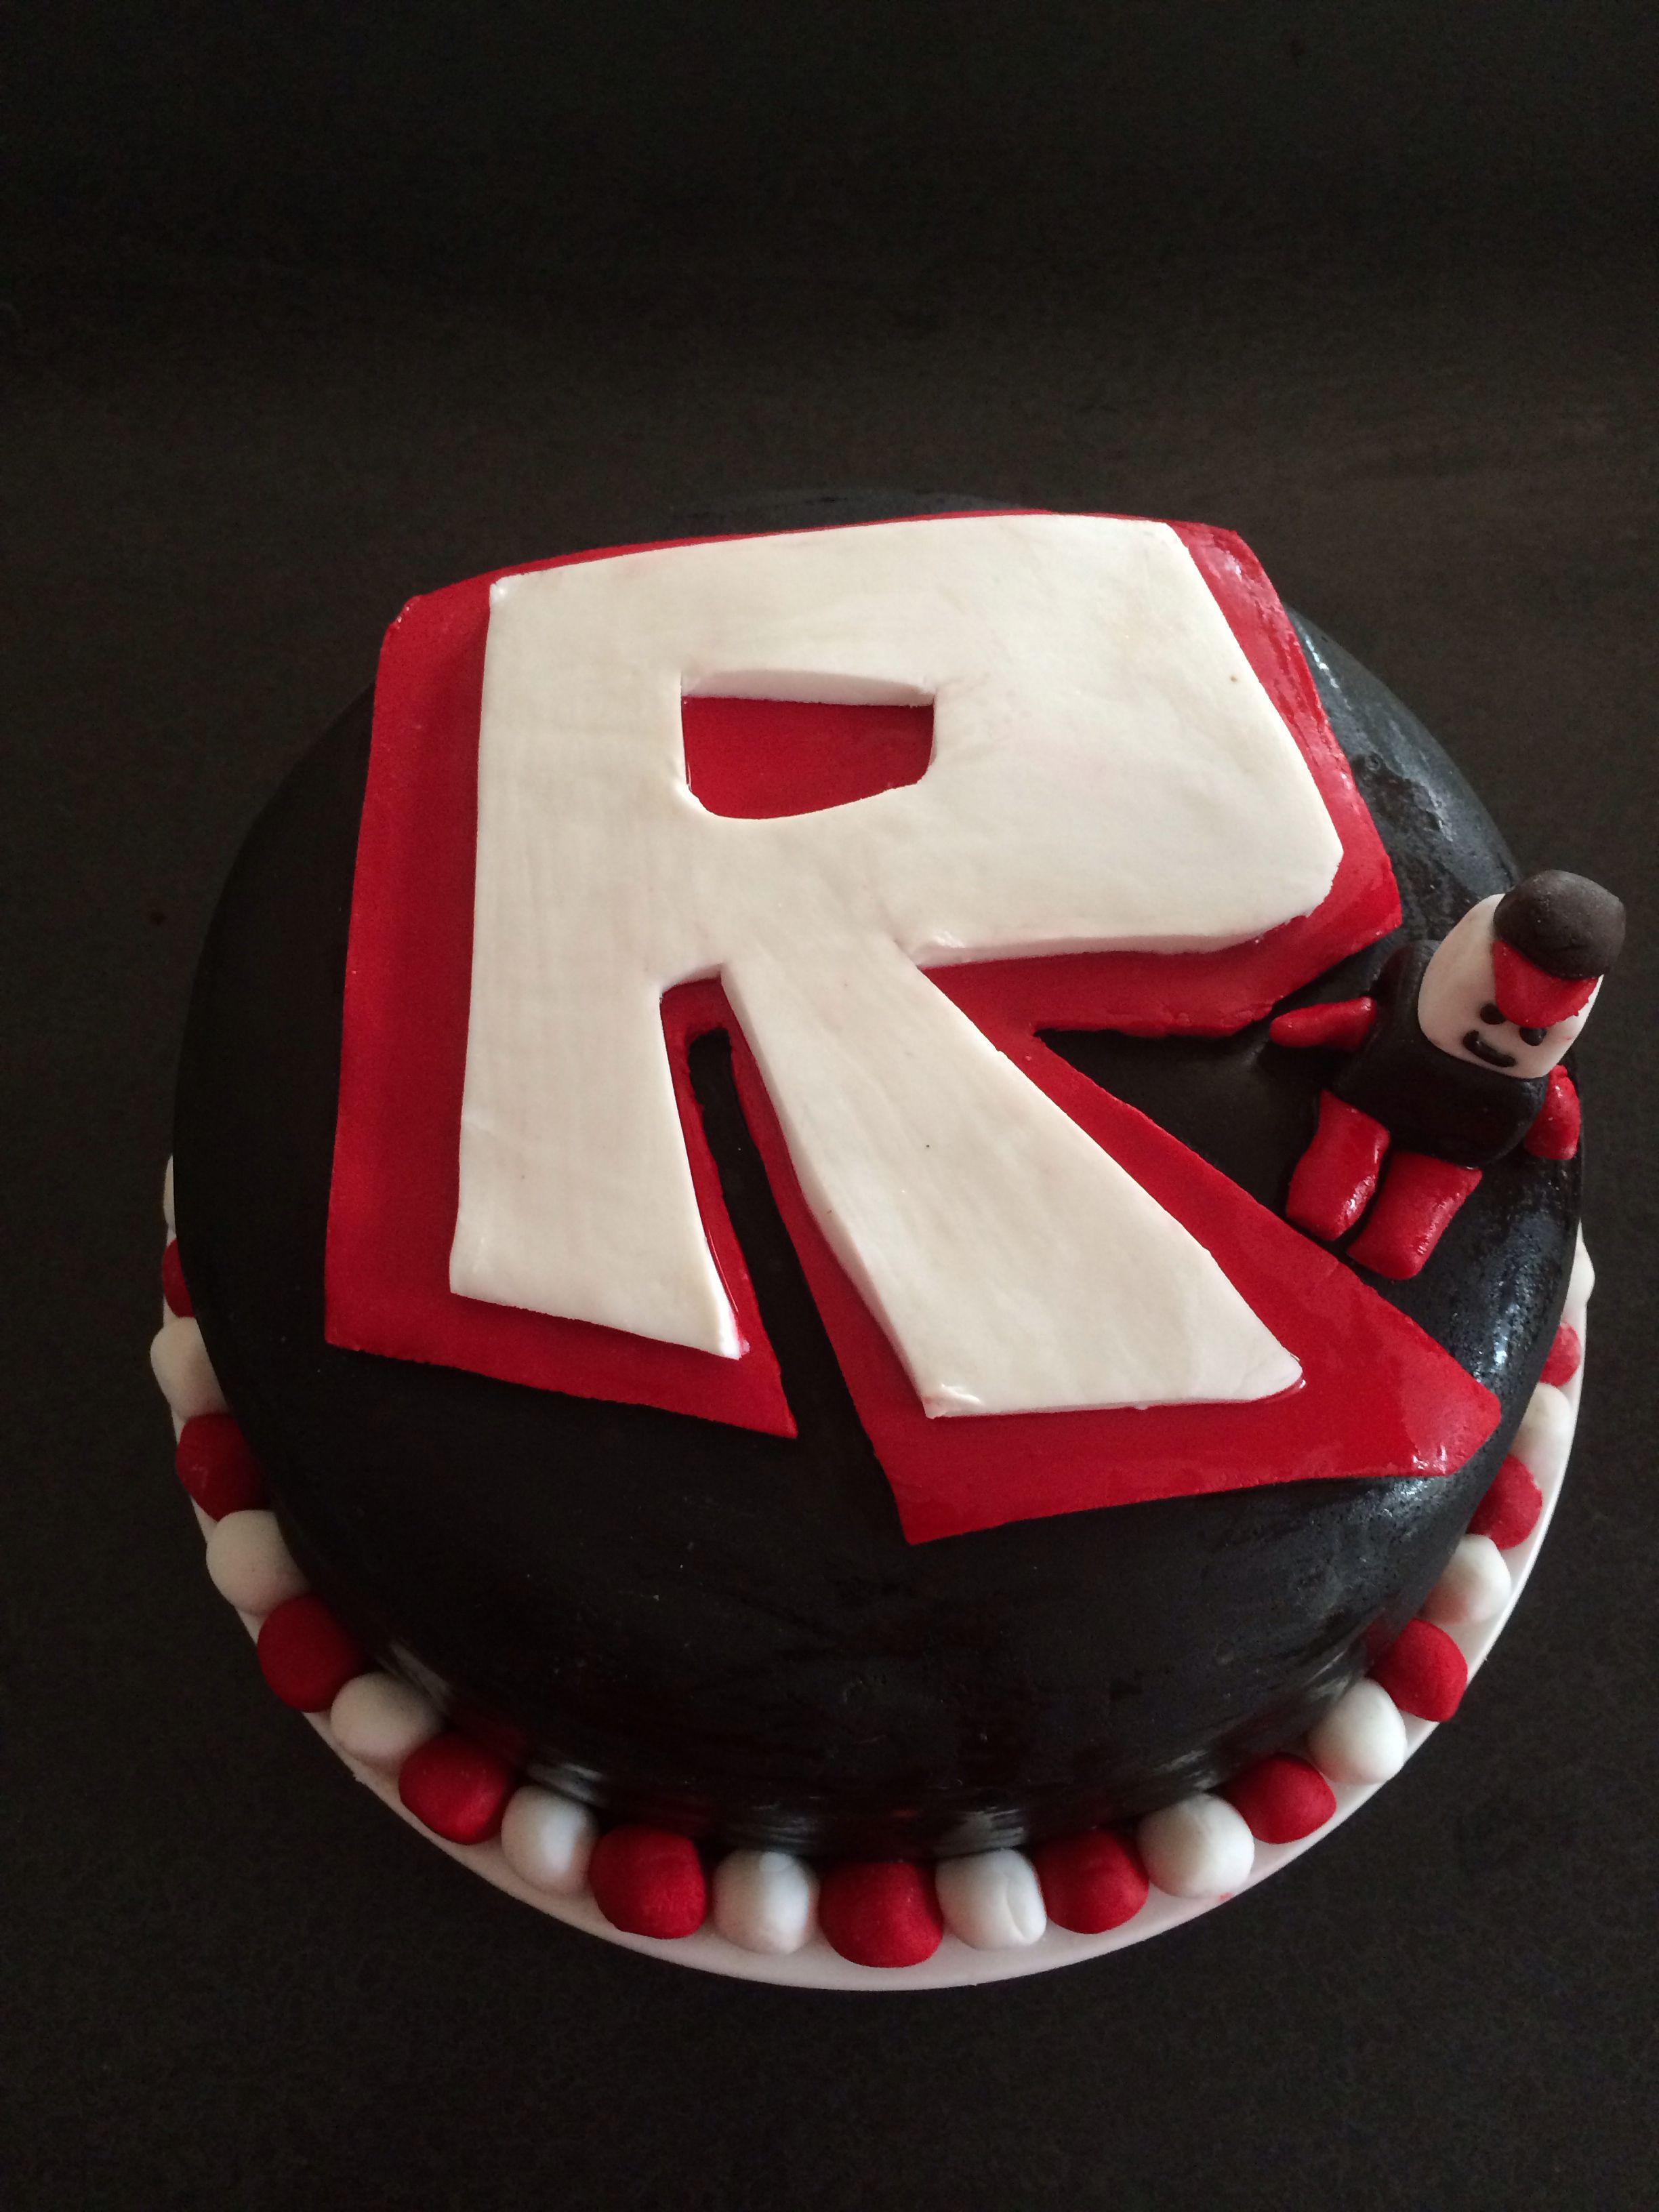 Easy Roblox Birthday Cake Ideas Pin By Farrah Ezell On Kids Cakes Roblox Birthday Cake Roblox Cake Birthday Cake Kids